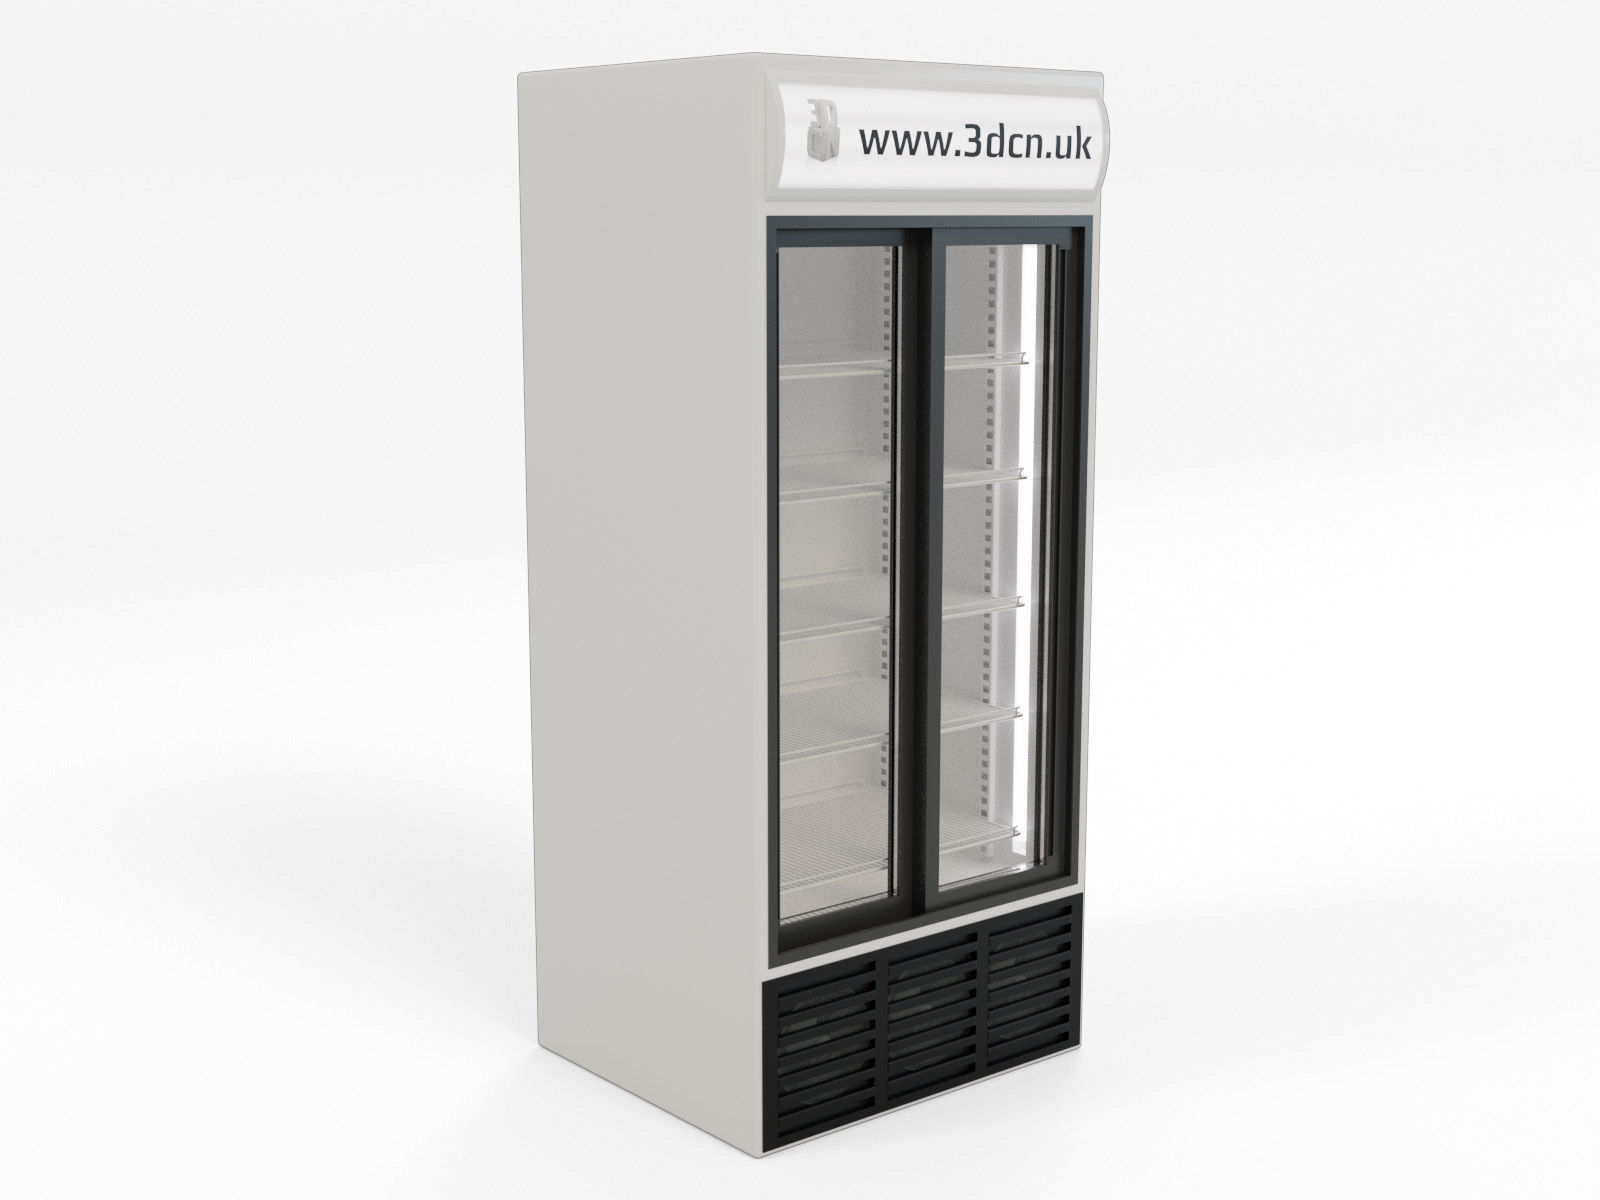 Freezer supermarket display unit